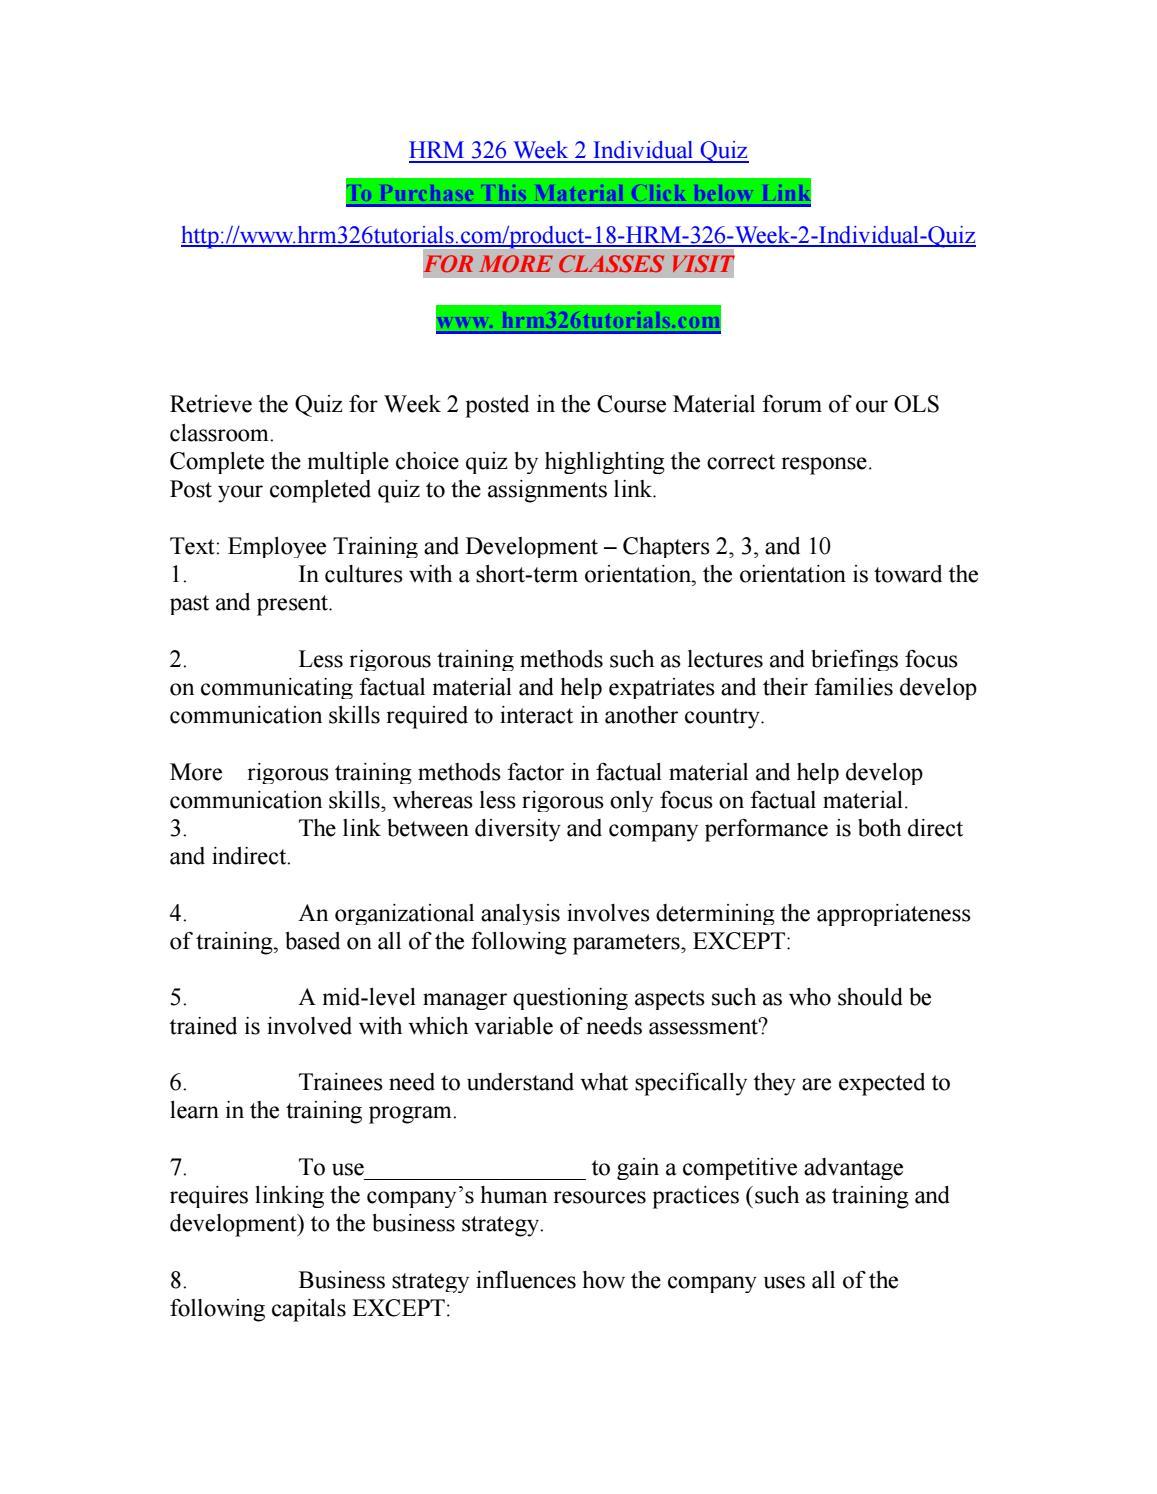 Hrm 326 week 2 individual quiz by JenniferBall37 - issuu